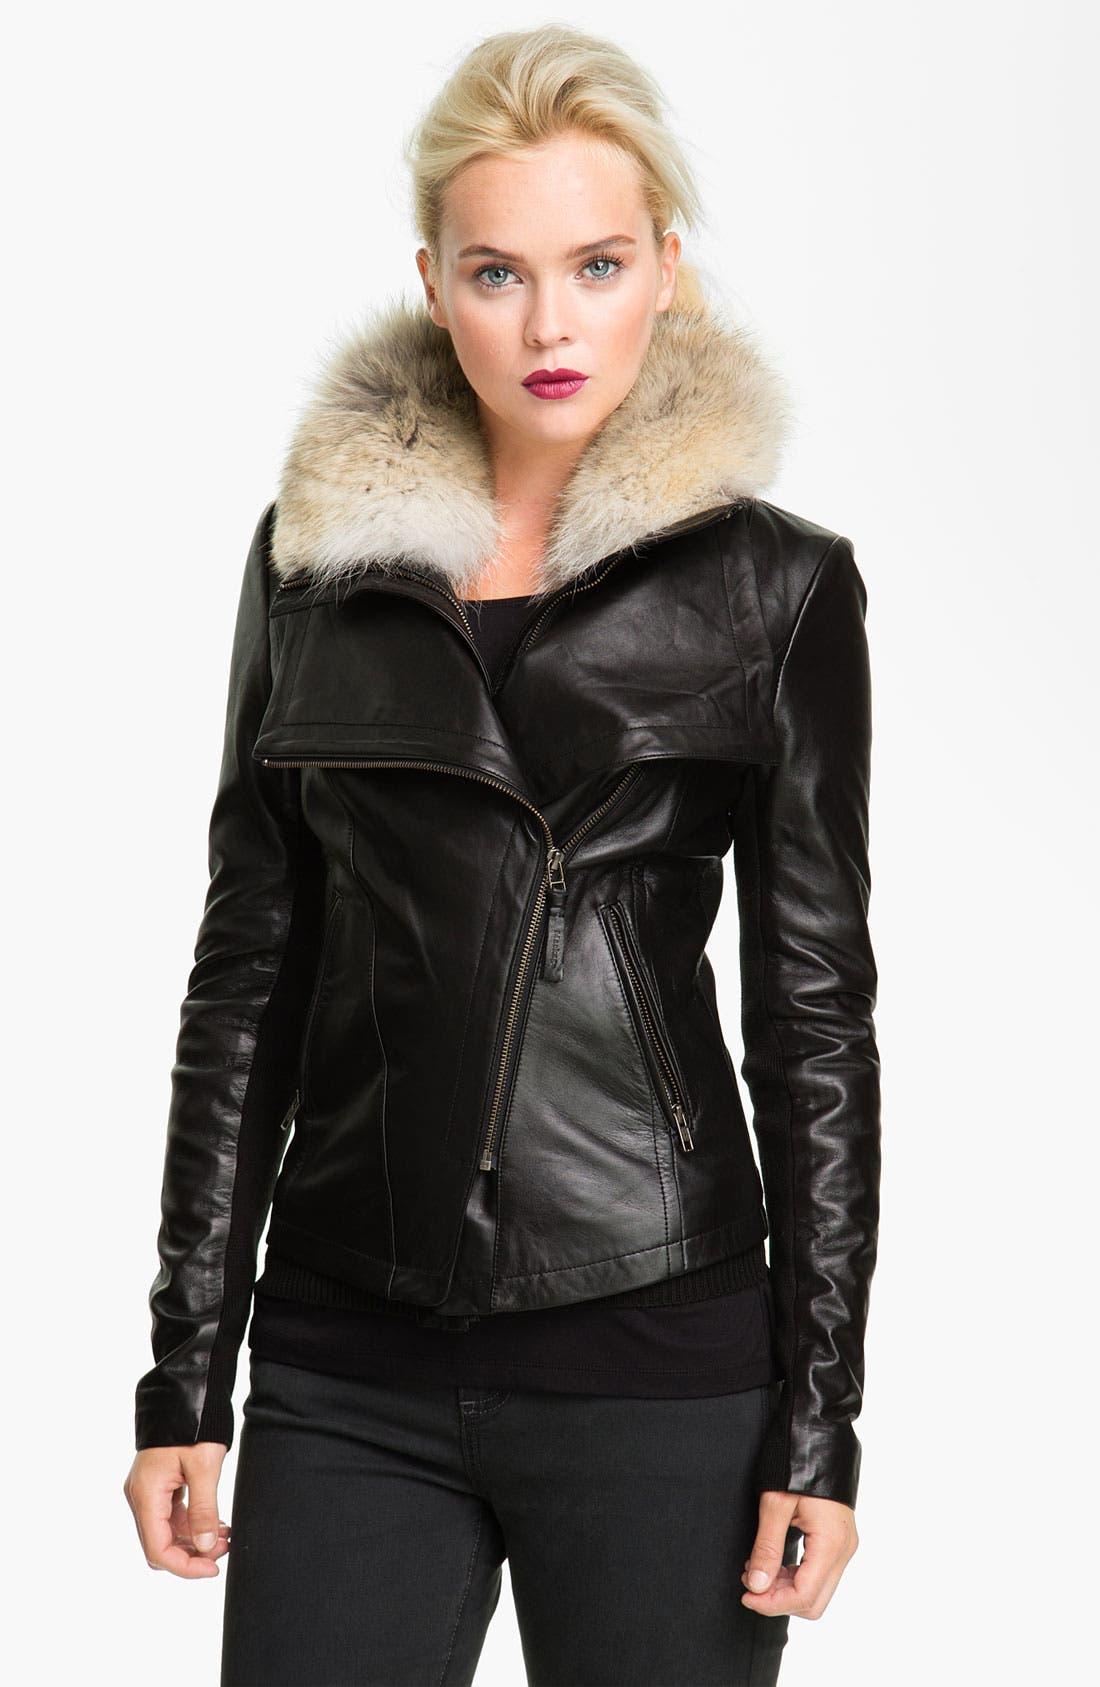 Alternate Image 1 Selected - Mackage 'Jora' Genuine Coyote Fur Collar Leather Jacket with Removable Vest